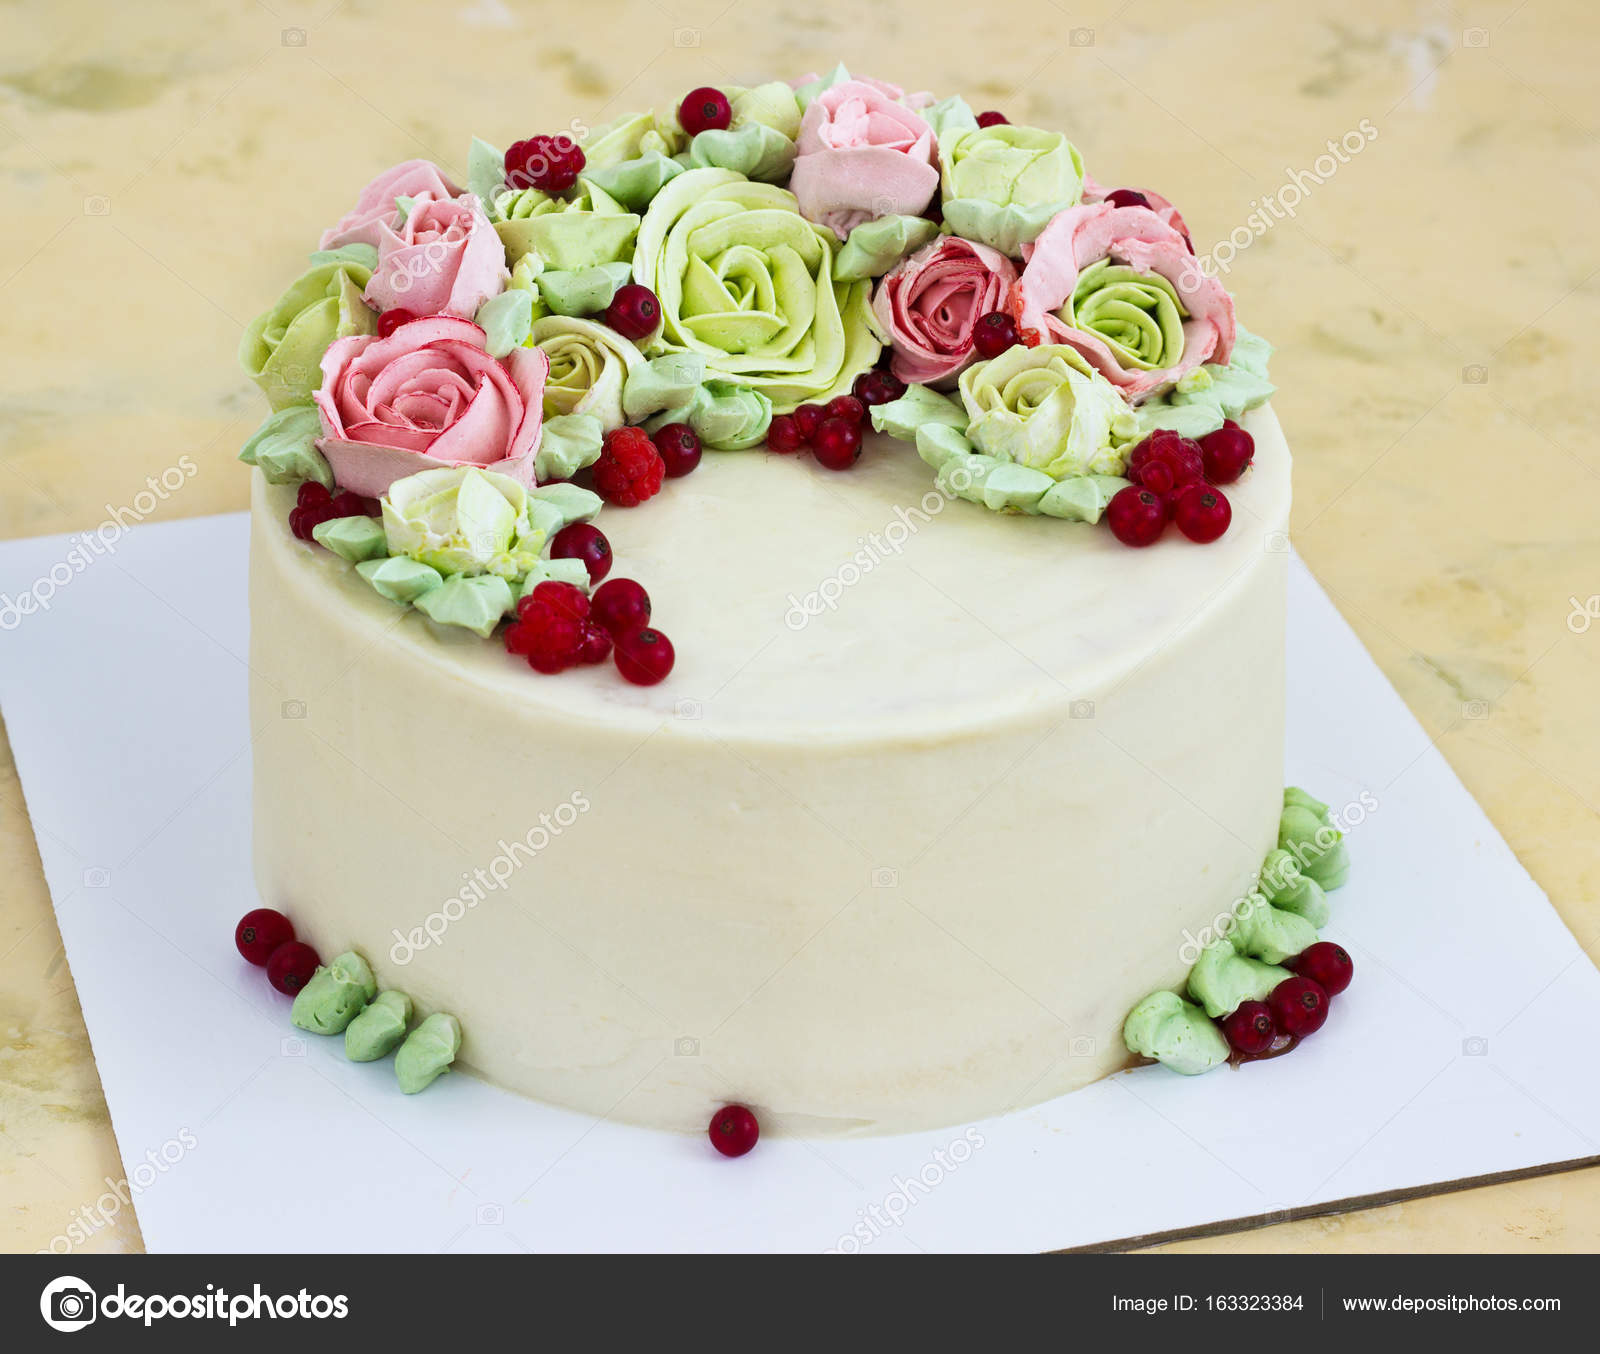 Birthday cake with flowers rose on light background stock photo birthday cake with flowers rose on light background stock photo izmirmasajfo